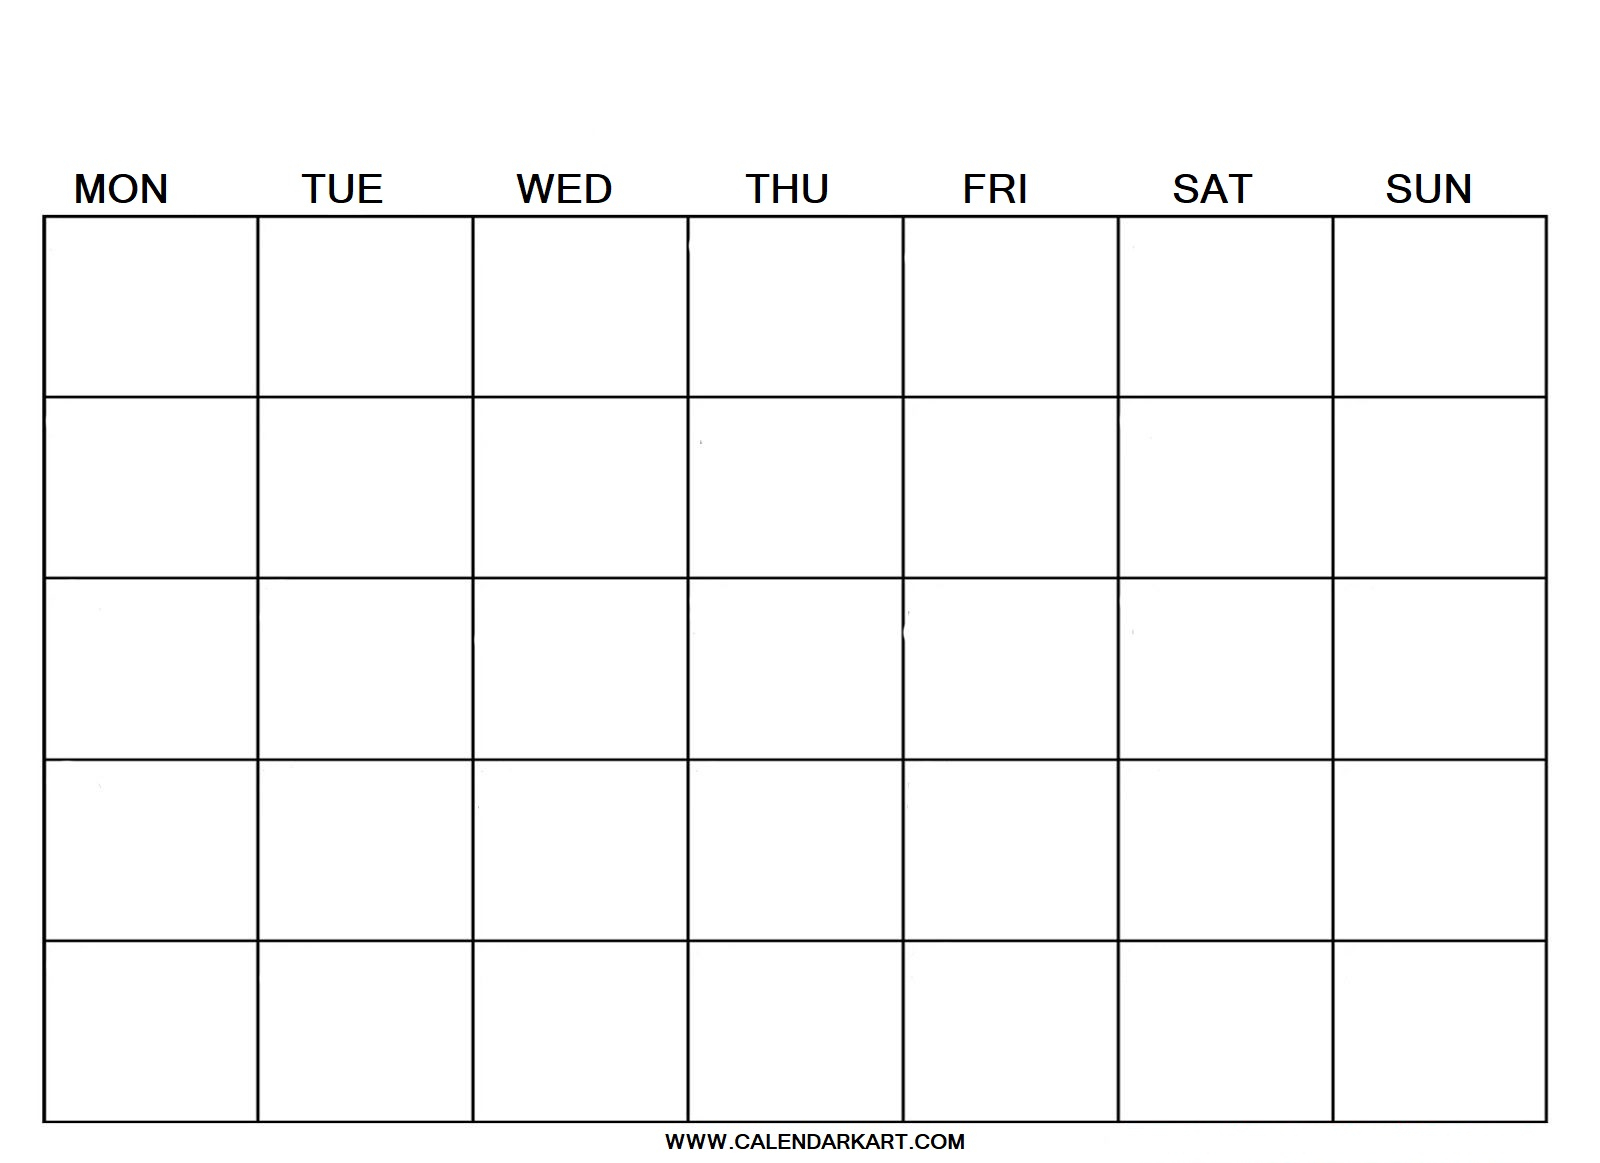 Blank Calendar - Calendar-Kart